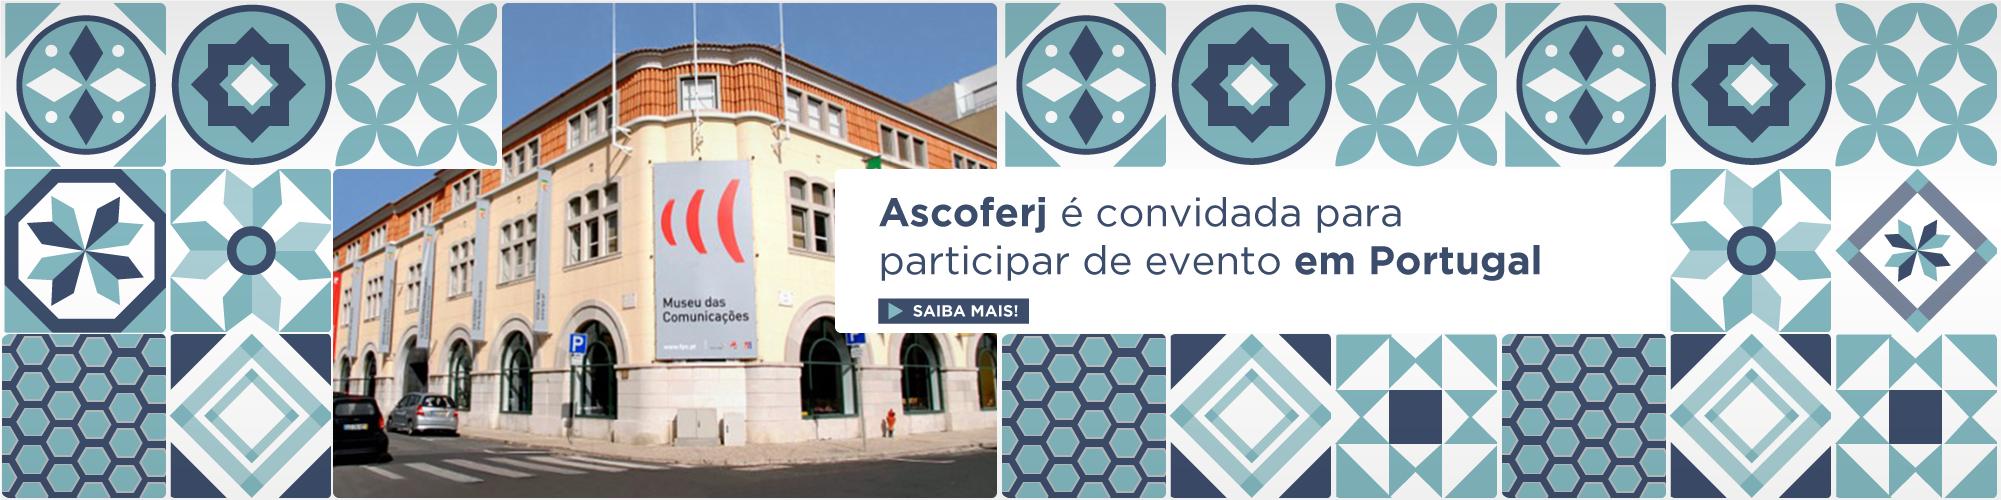 Ascoferj_MidiasSociaisMar2017_BannerPortugal